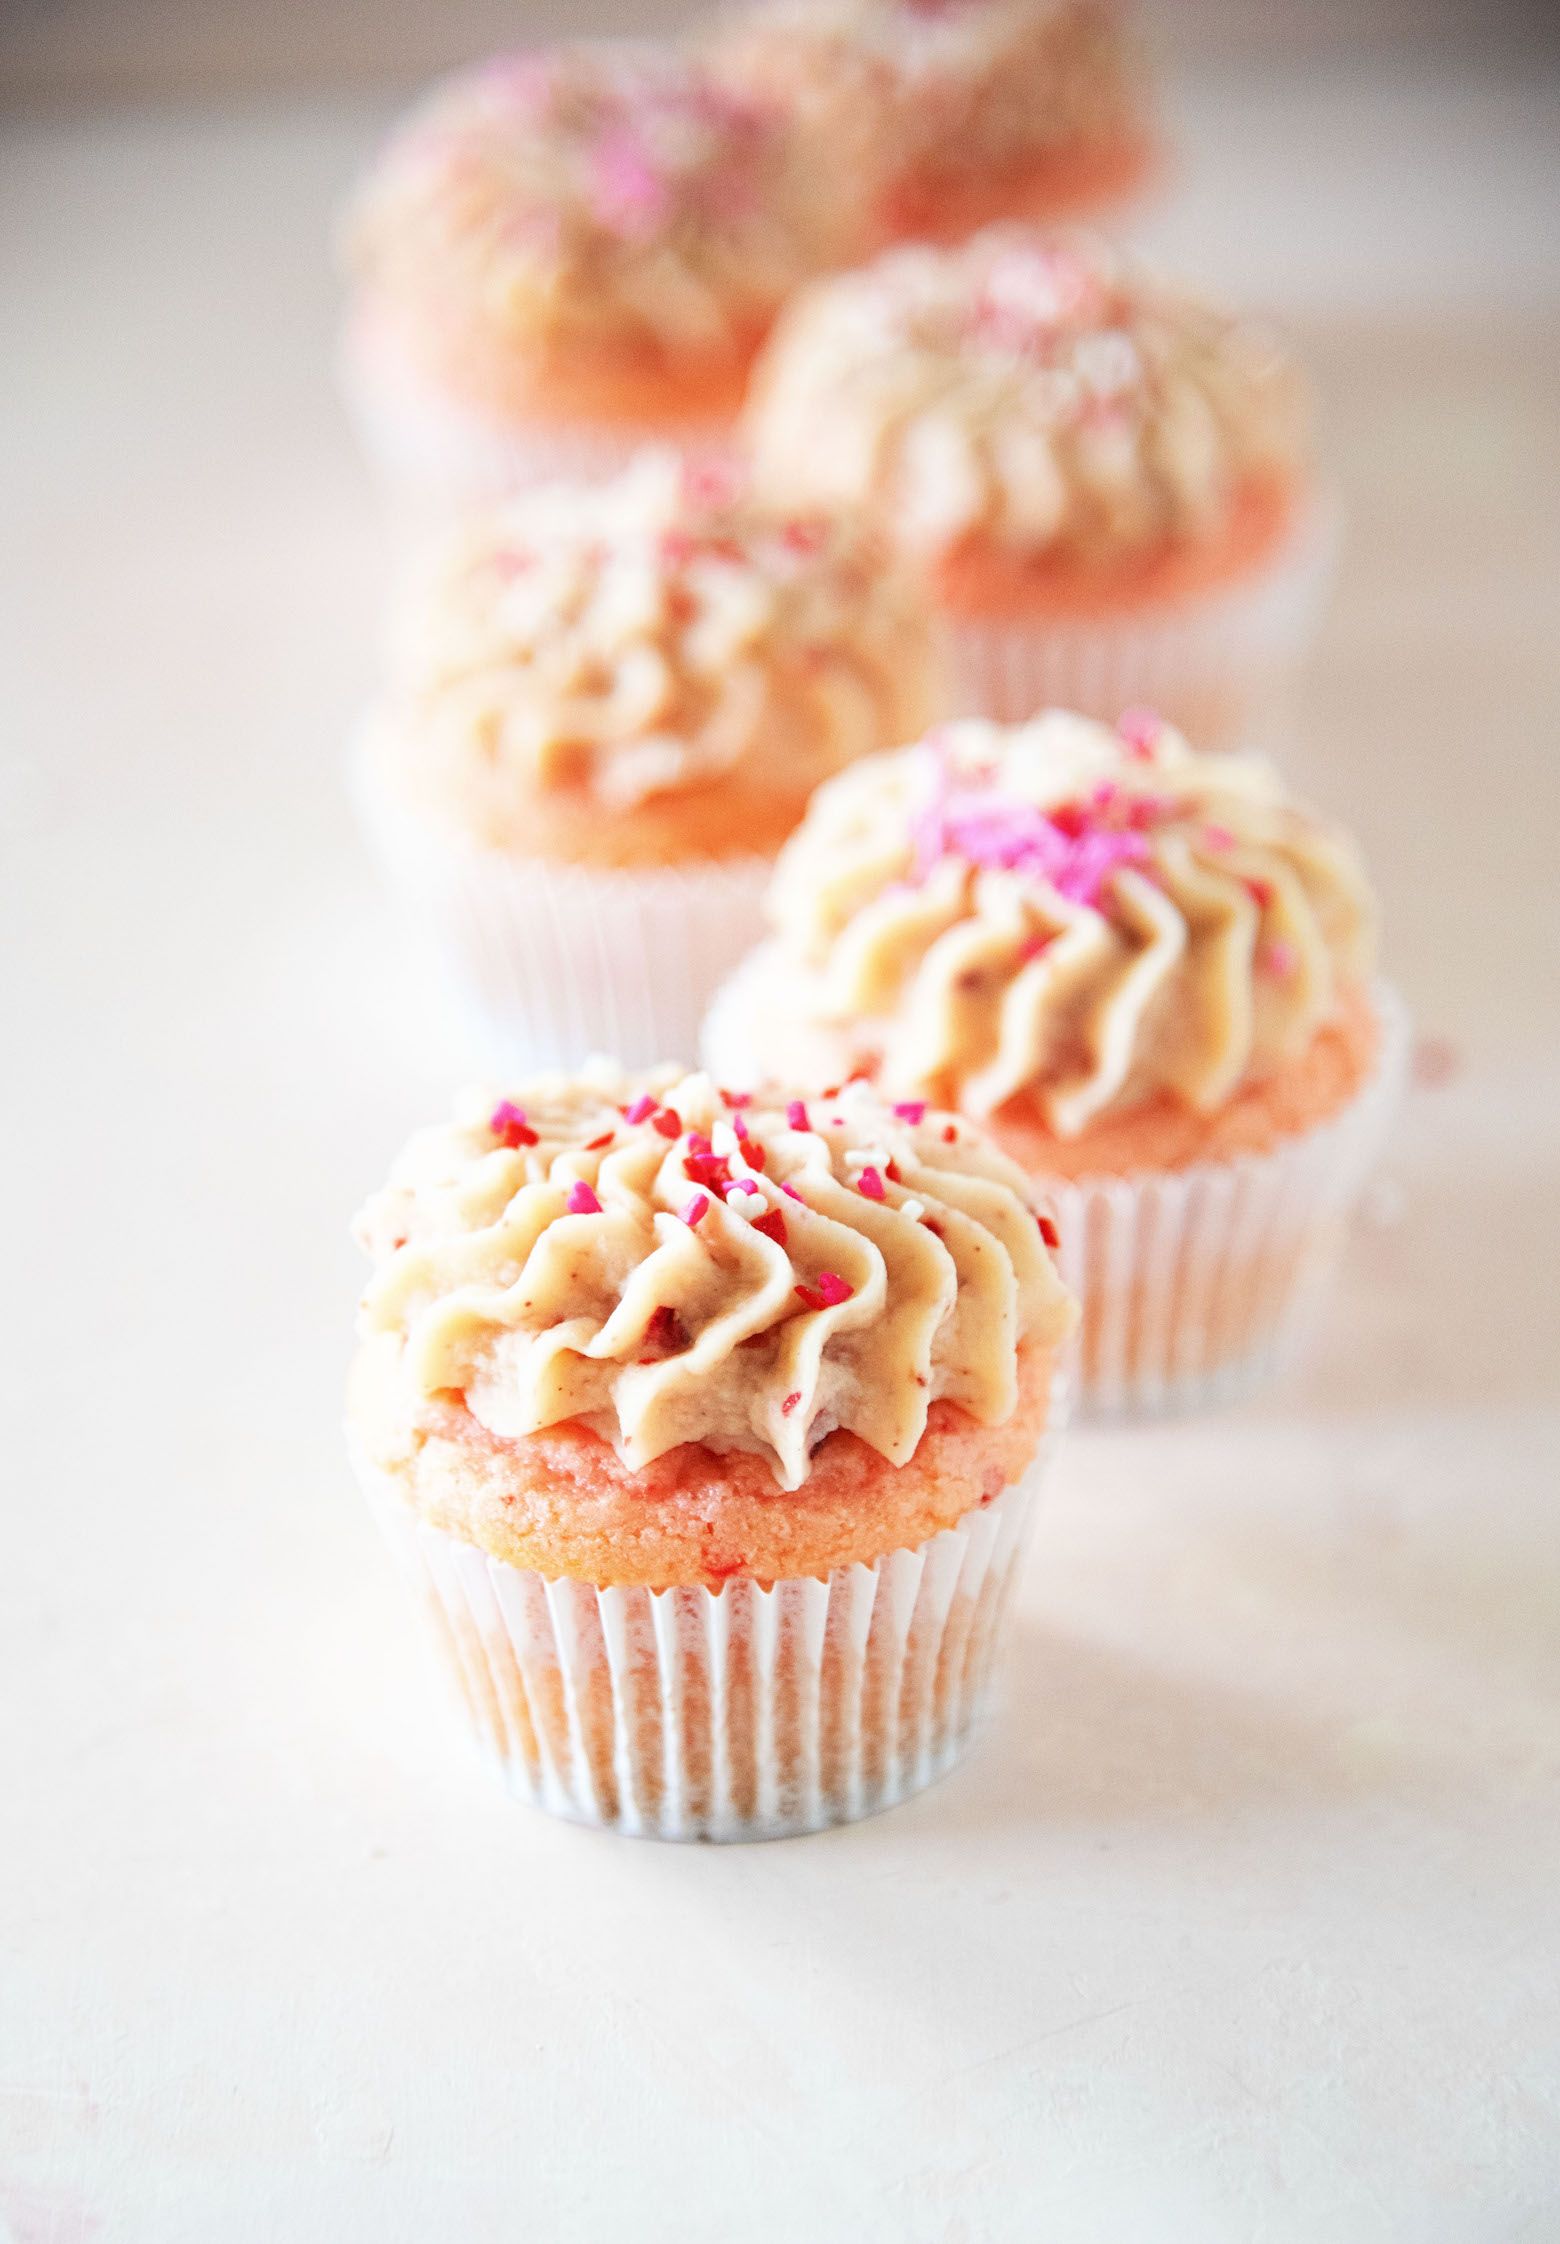 Strawberry Malted Milk Cupcakes